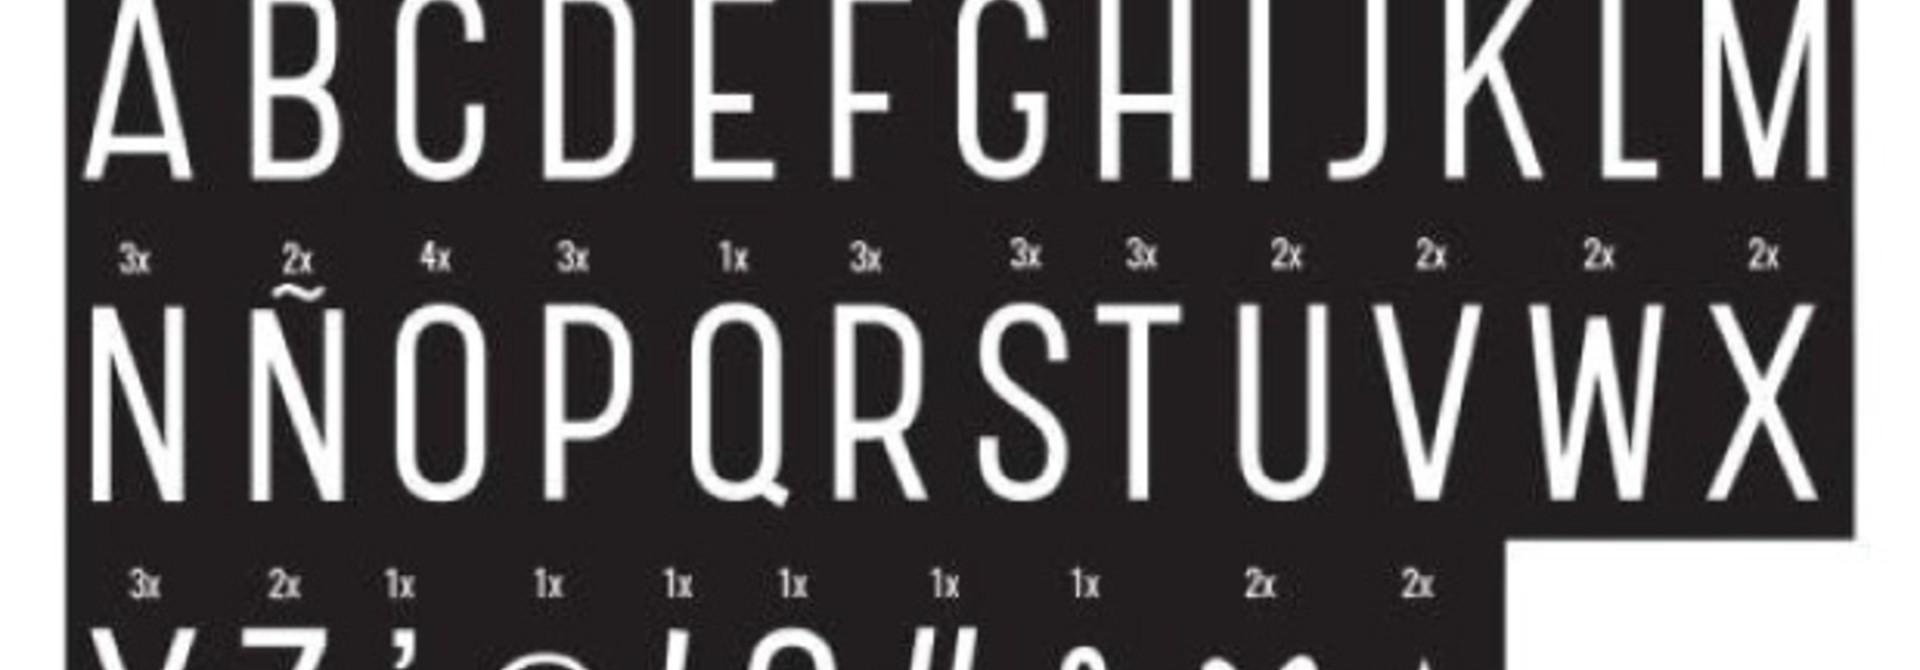 Symbolenset Monochrome voor lightbox A4 en A5